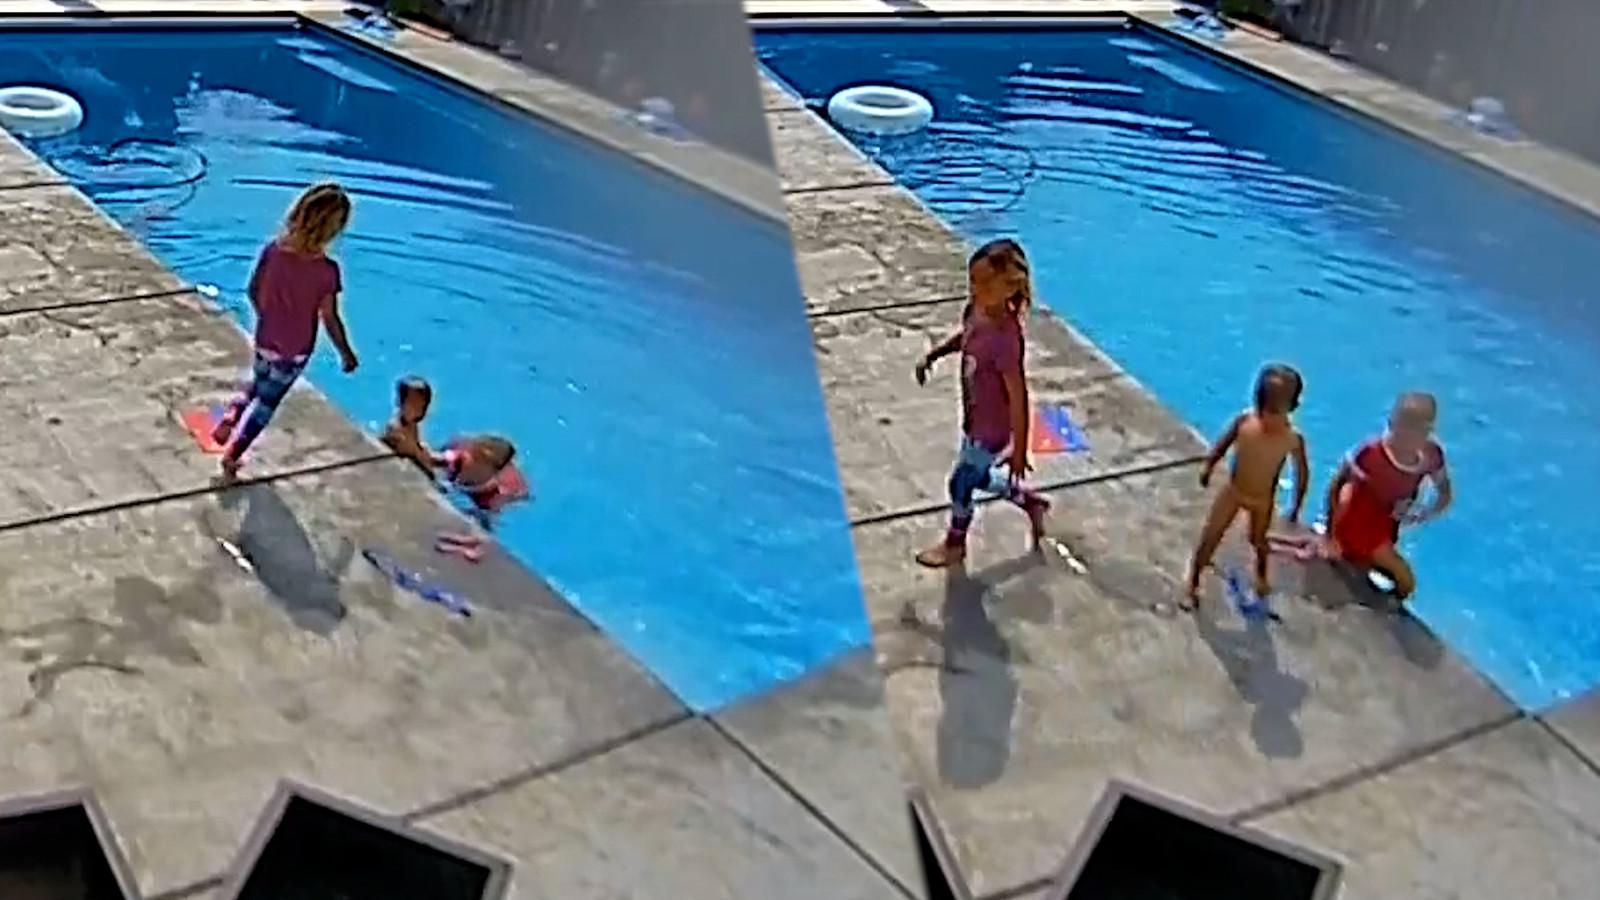 Zusjes redden hun kleine broer van verdrinking